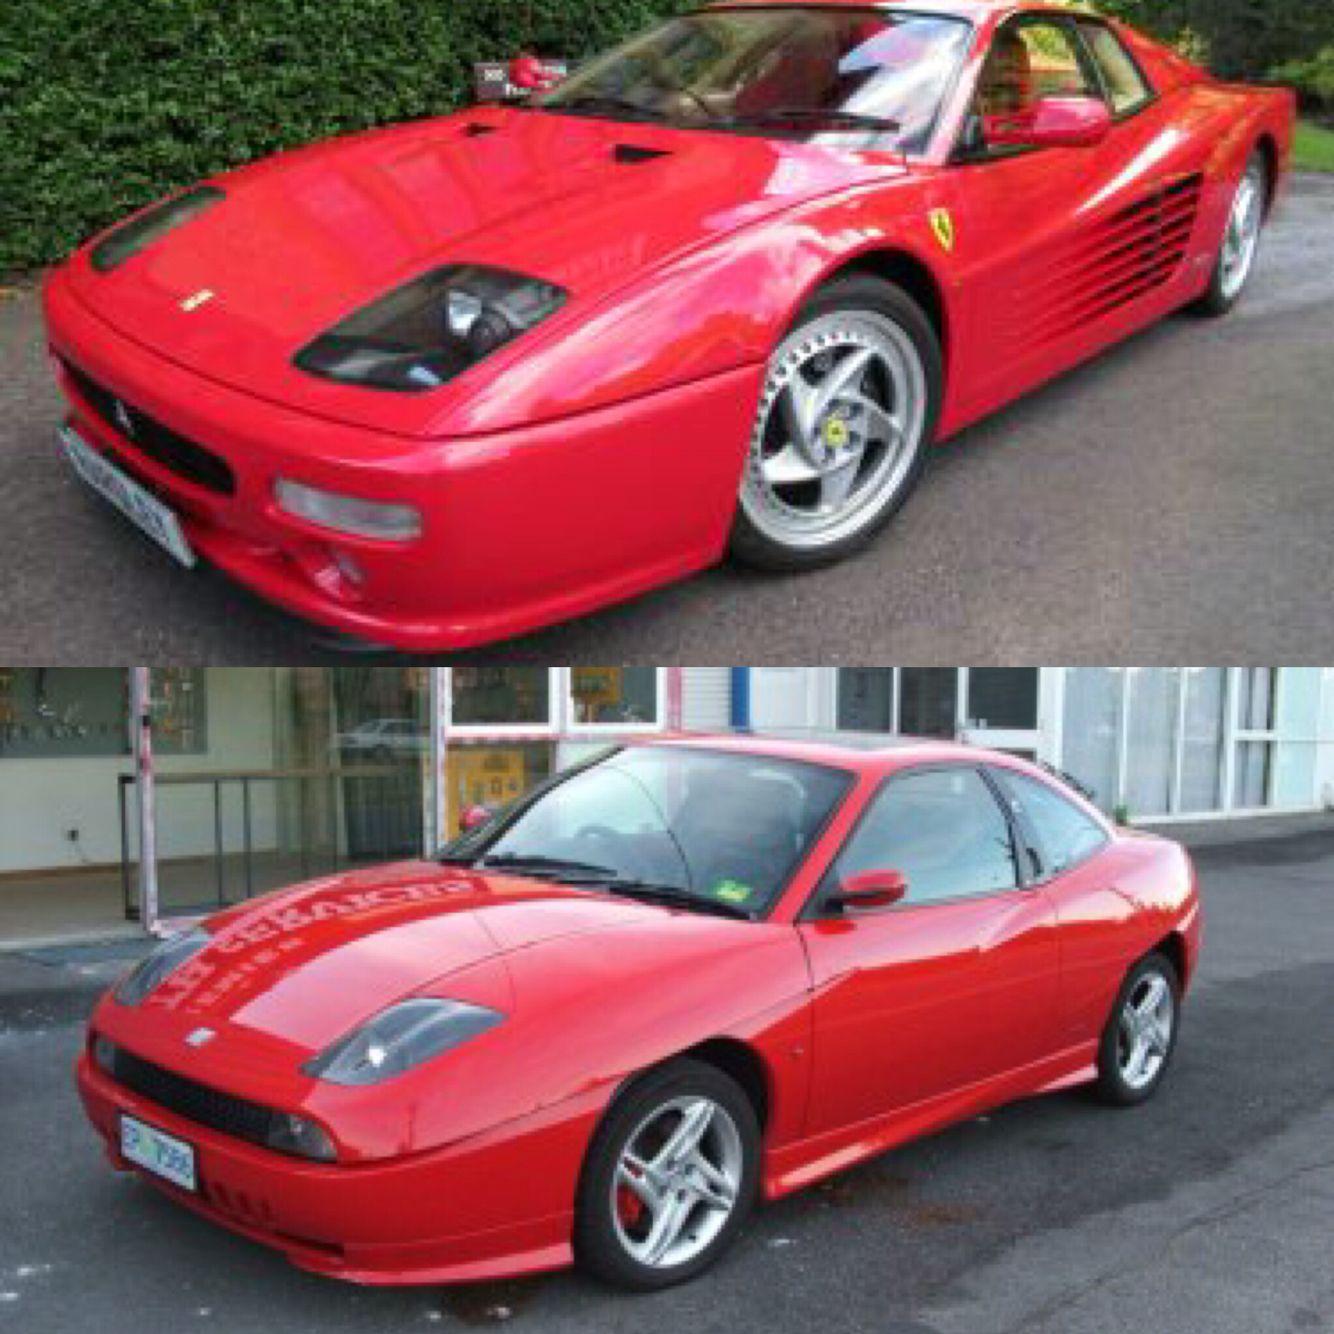 Distant Cousins Ferrari Fiat Enzari 512tr Fiatcoupe Cars Italia Cool Sports Cars Fiat Coupe Sports Cars